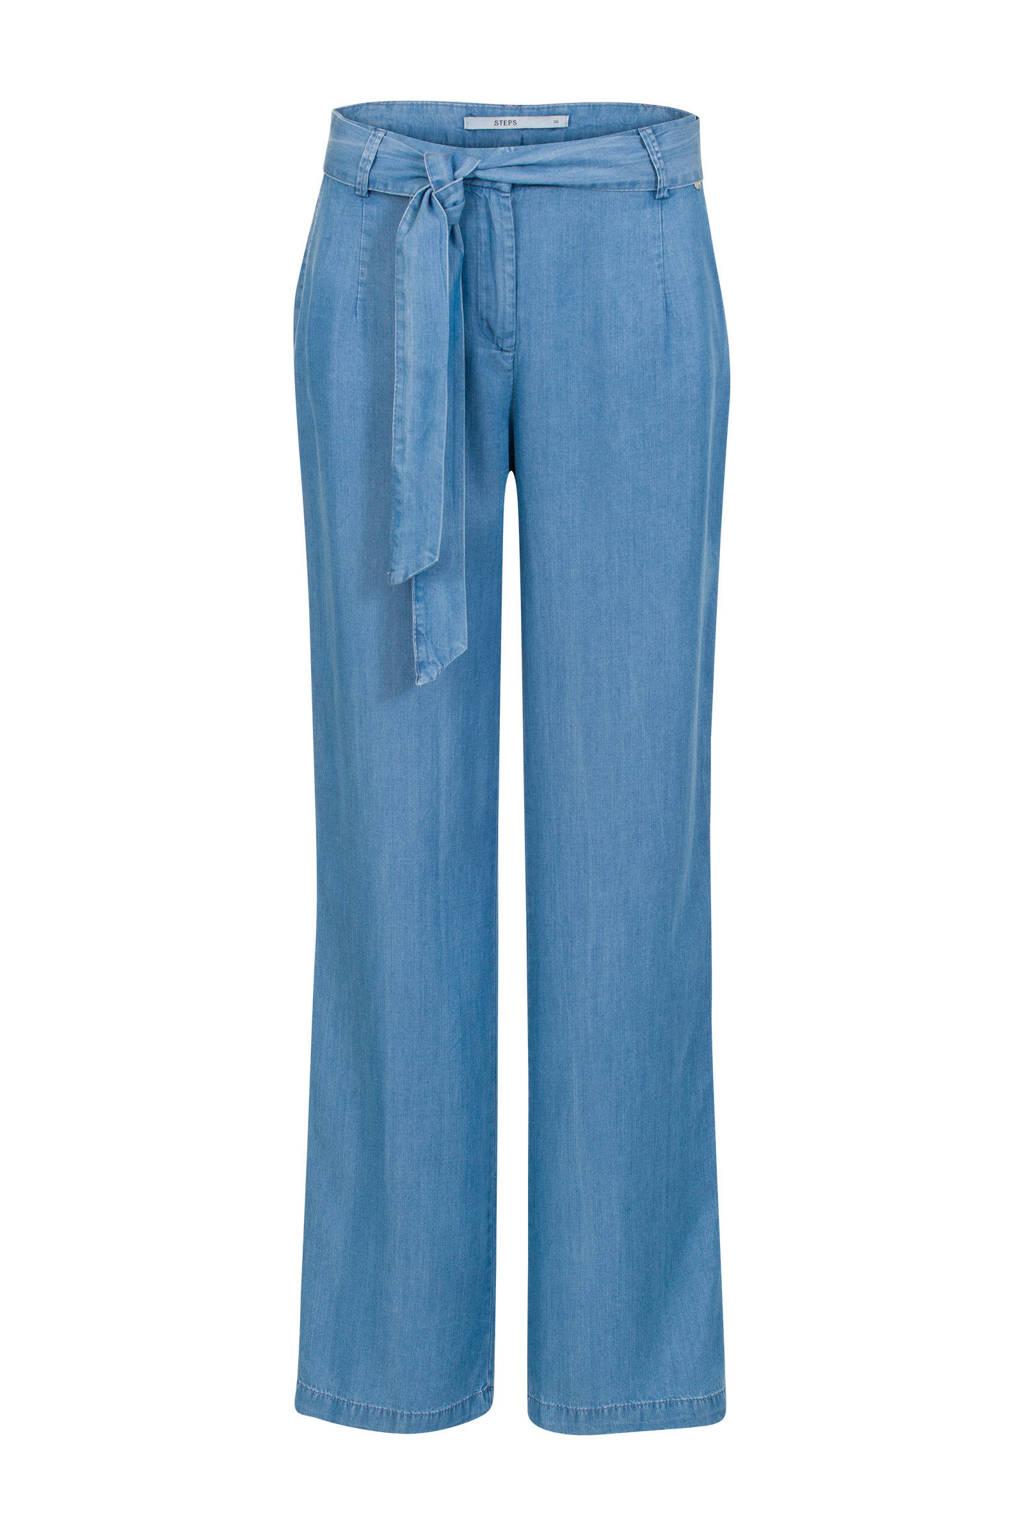 Steps high waist loose fit jeans, Light denim